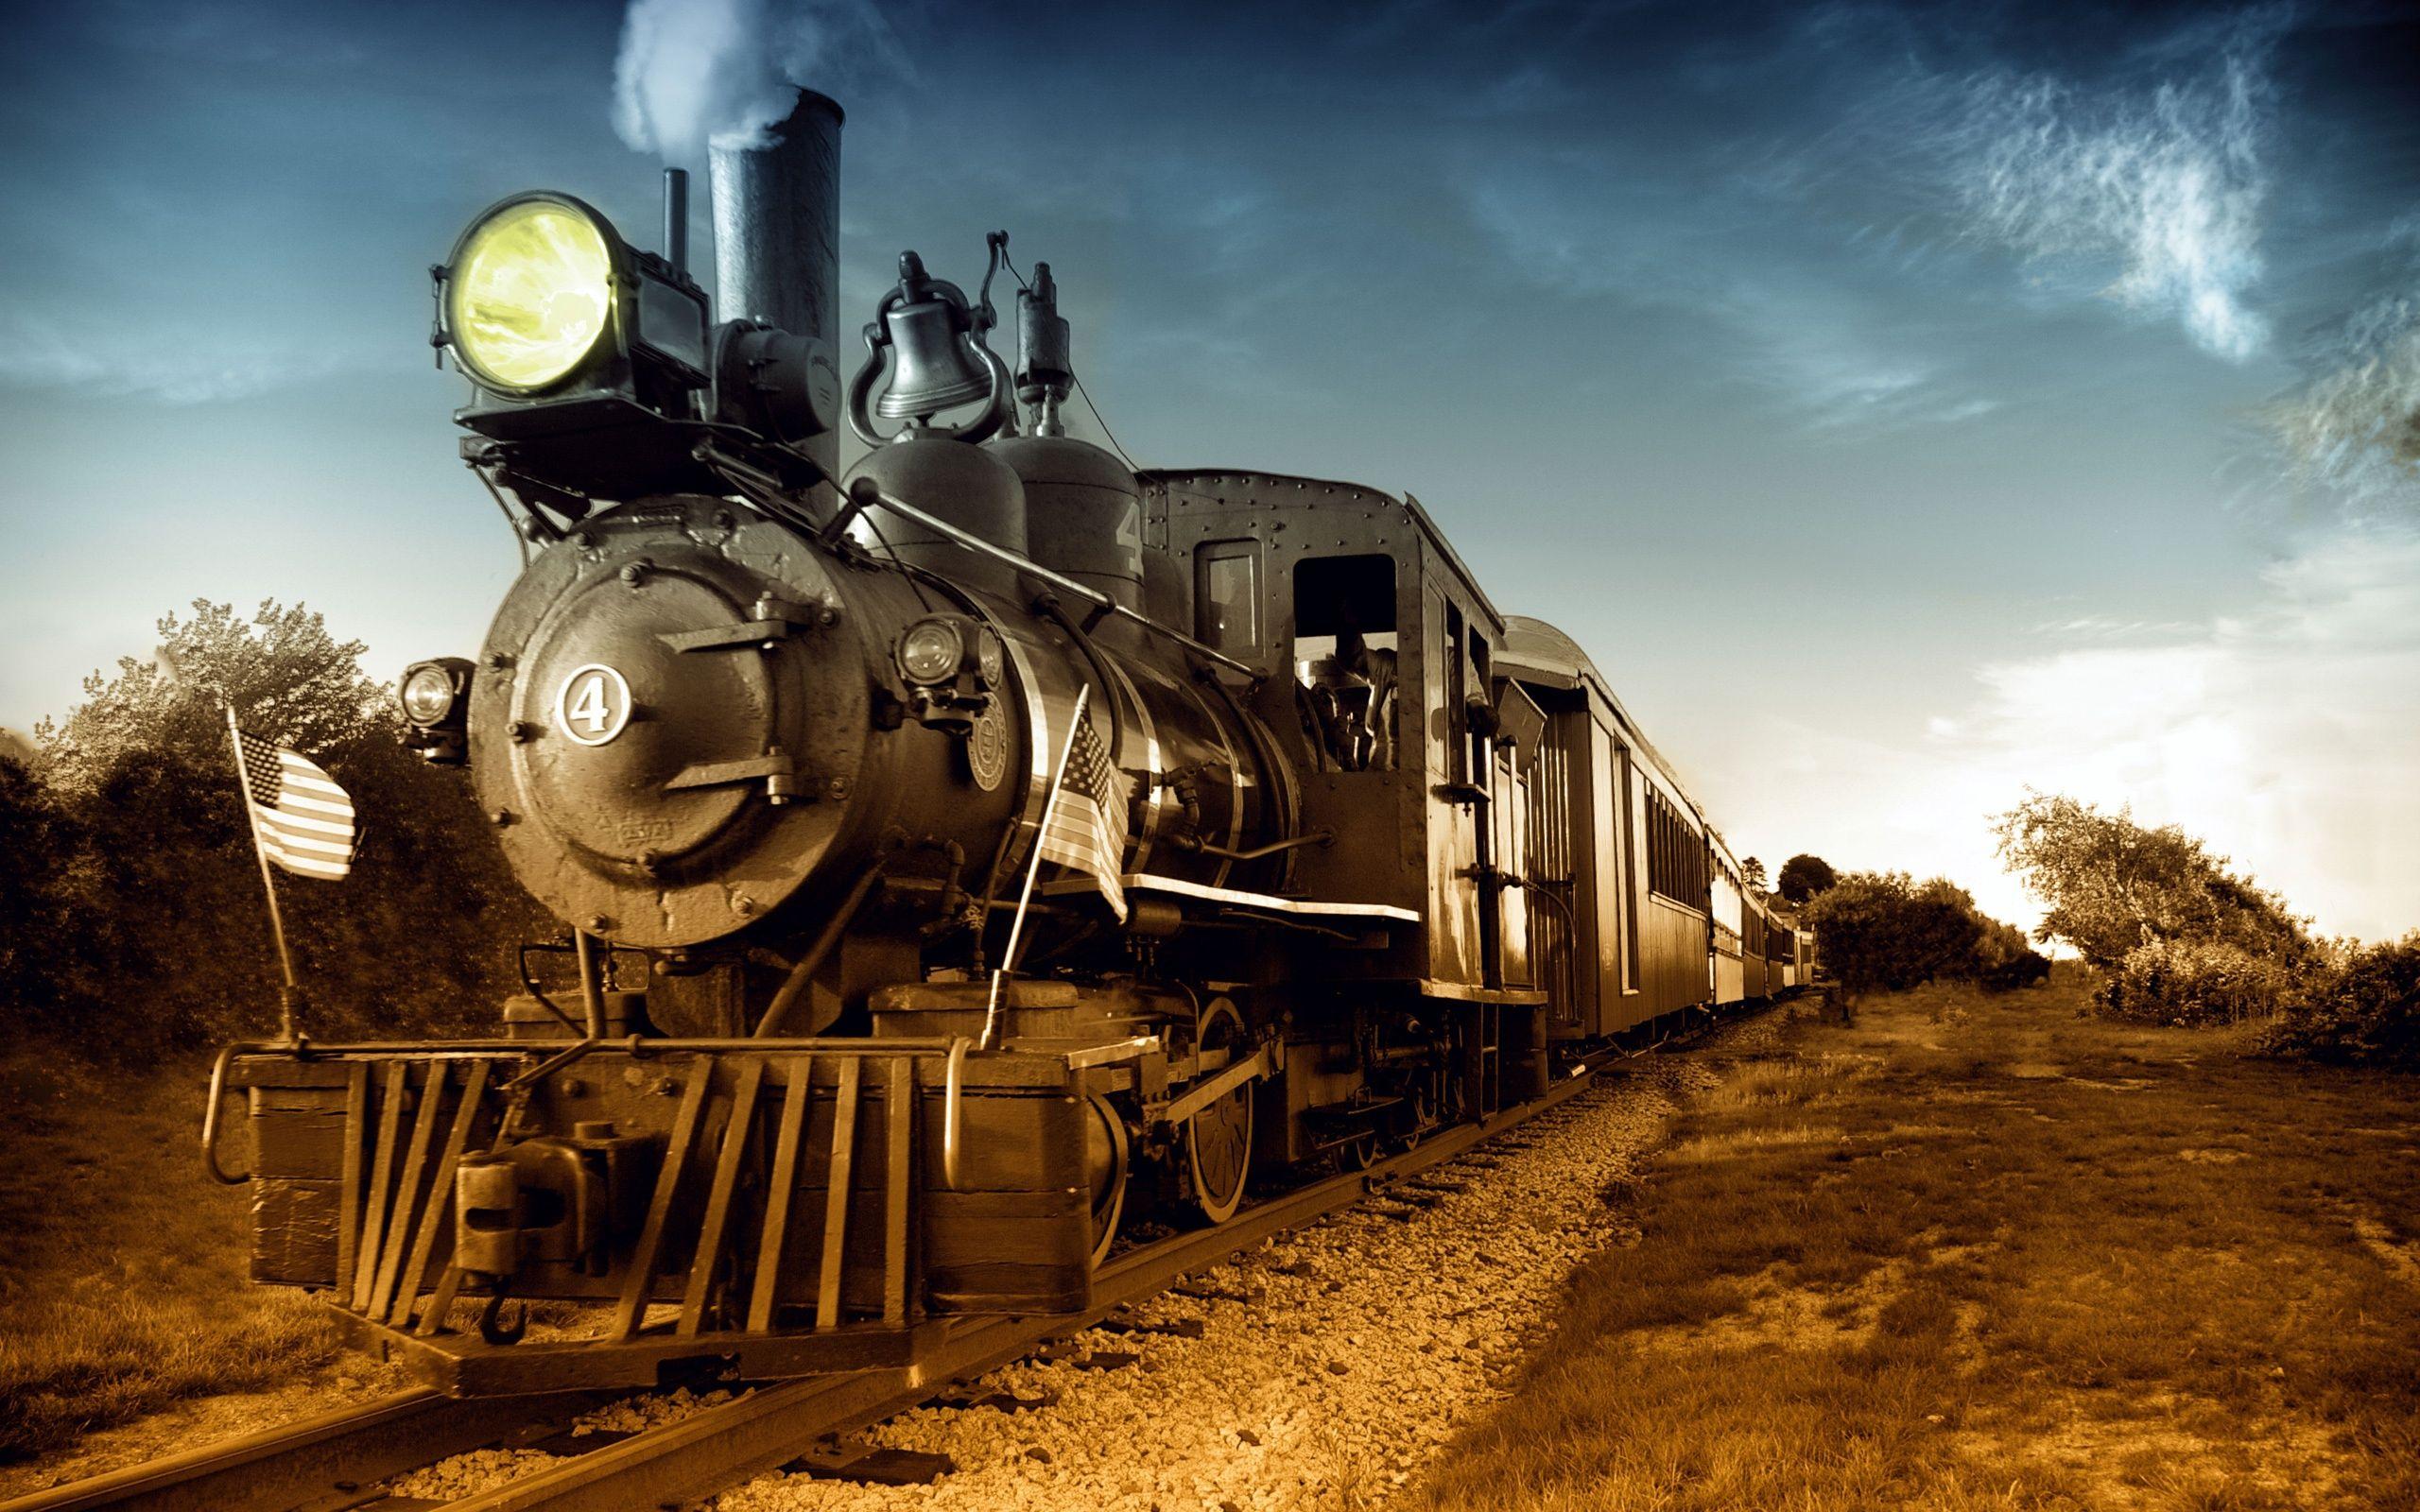 Nostalgic Steam Train Wallpaper 2560x1600 Tren Imagenes